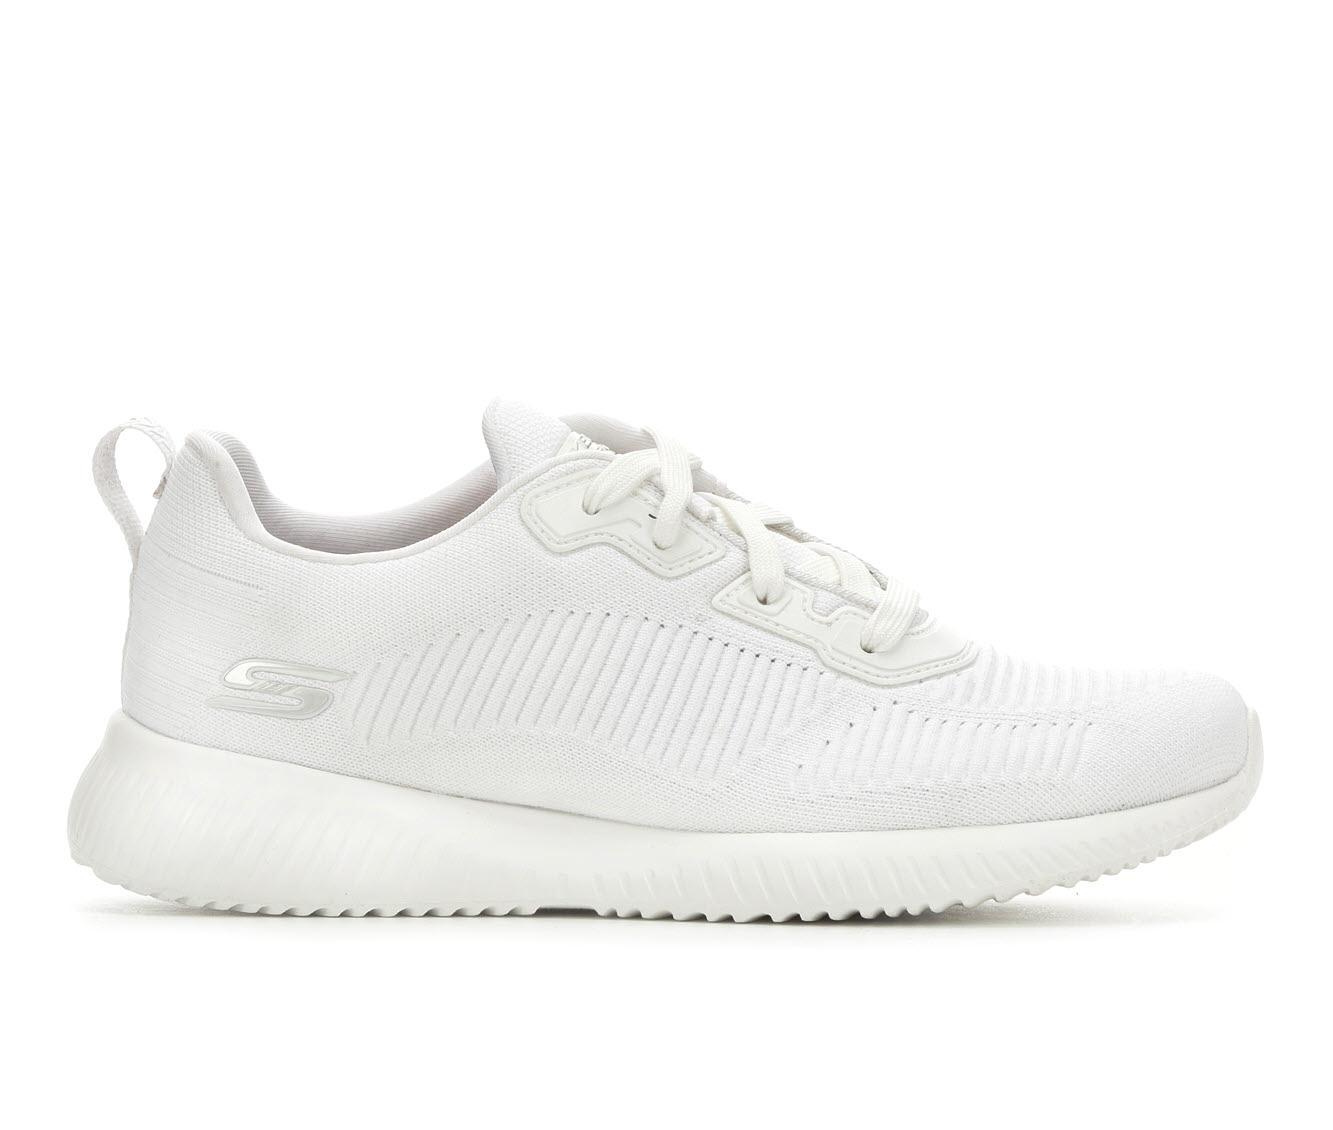 Skechers BOBS Tough Talk 32504 Women's Athletic Shoe (White)